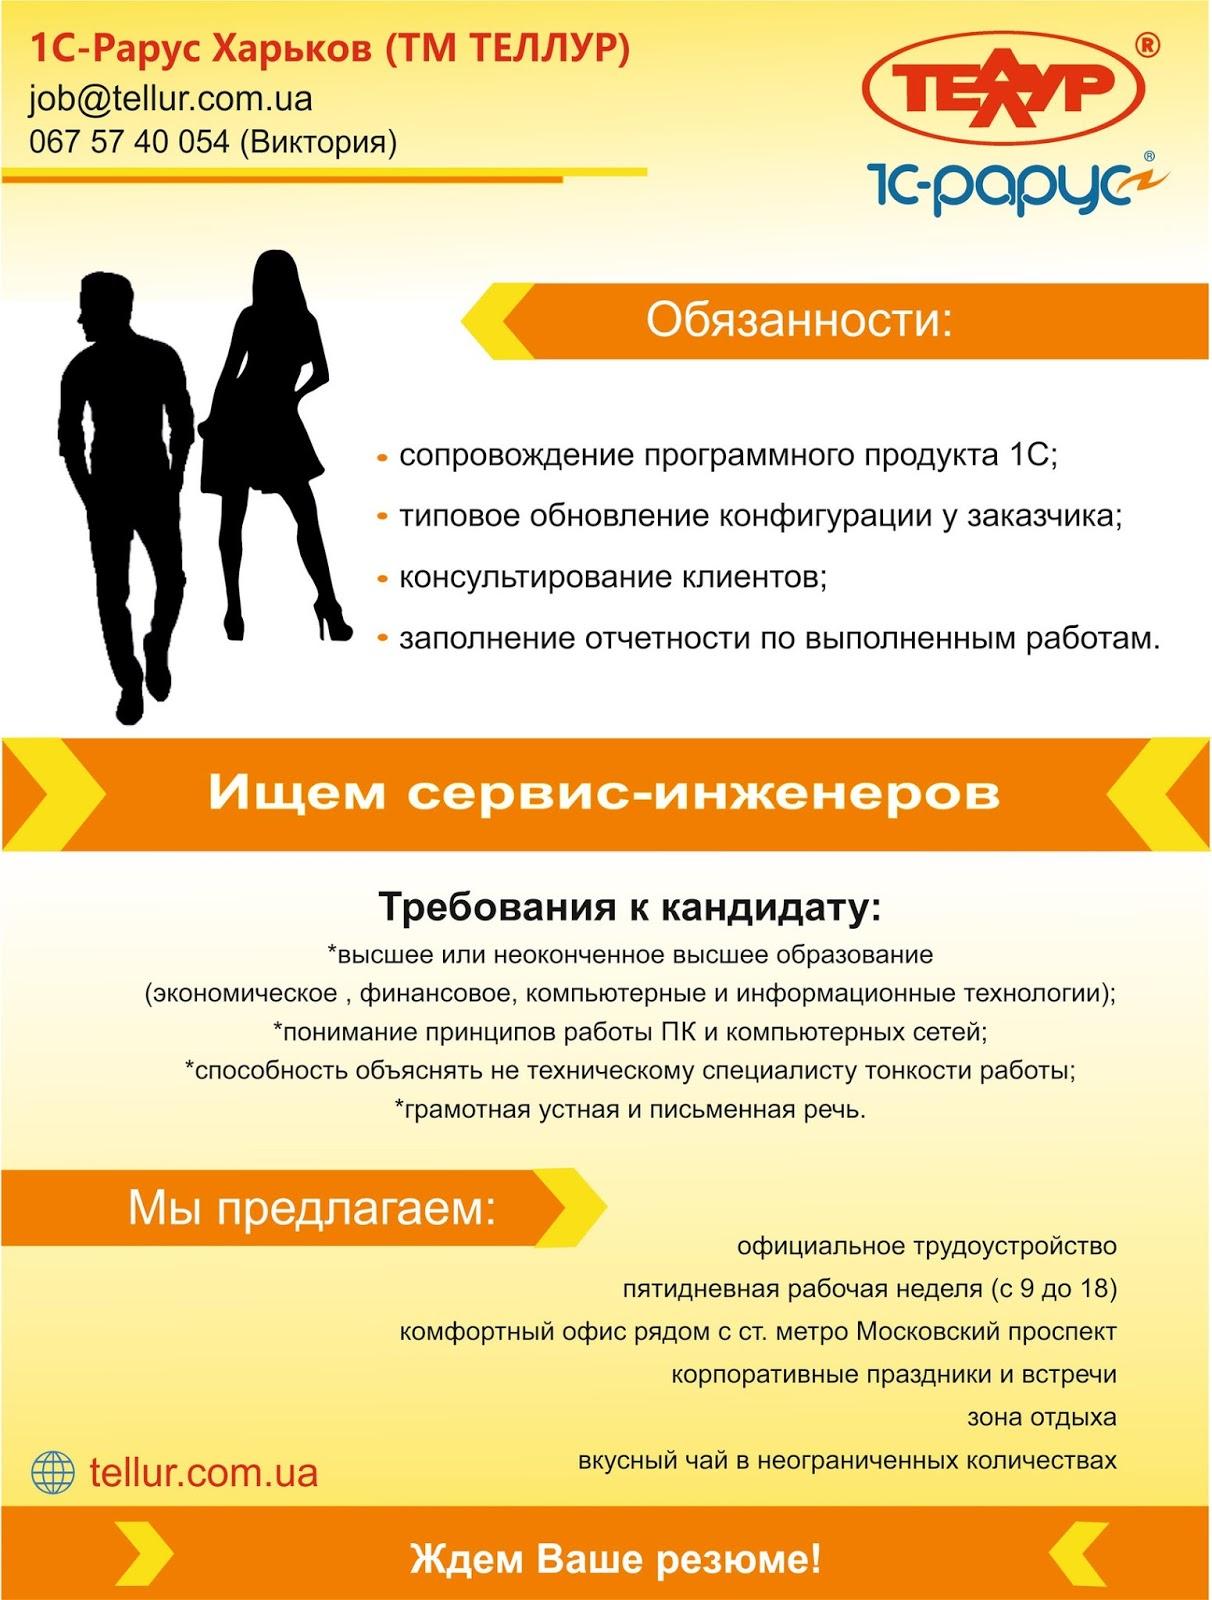 Вакансия в 1С-Рарус Харьков (ТМ ТЕЛЛУР)